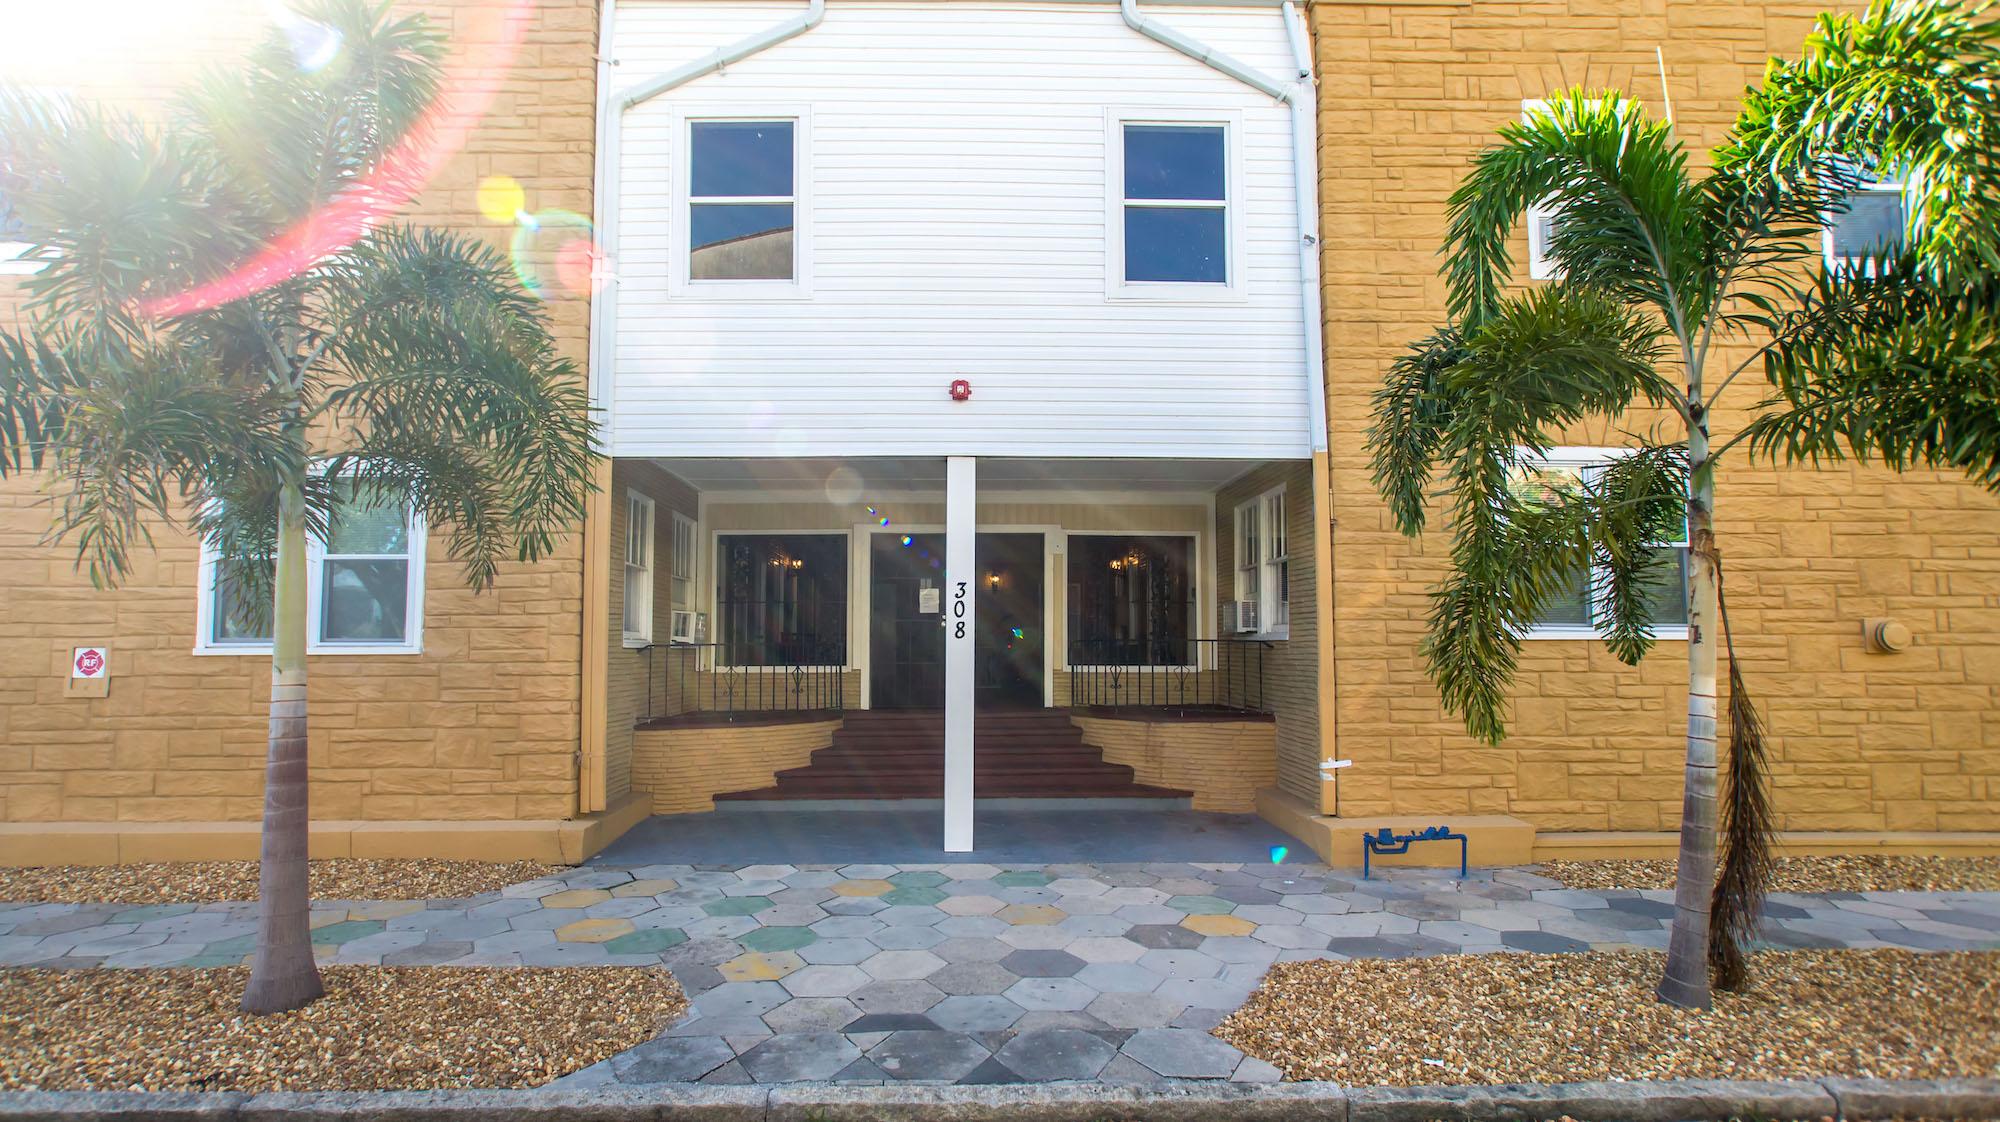 apartments for rent in 33701 fl rentcafe rh rentcafe com